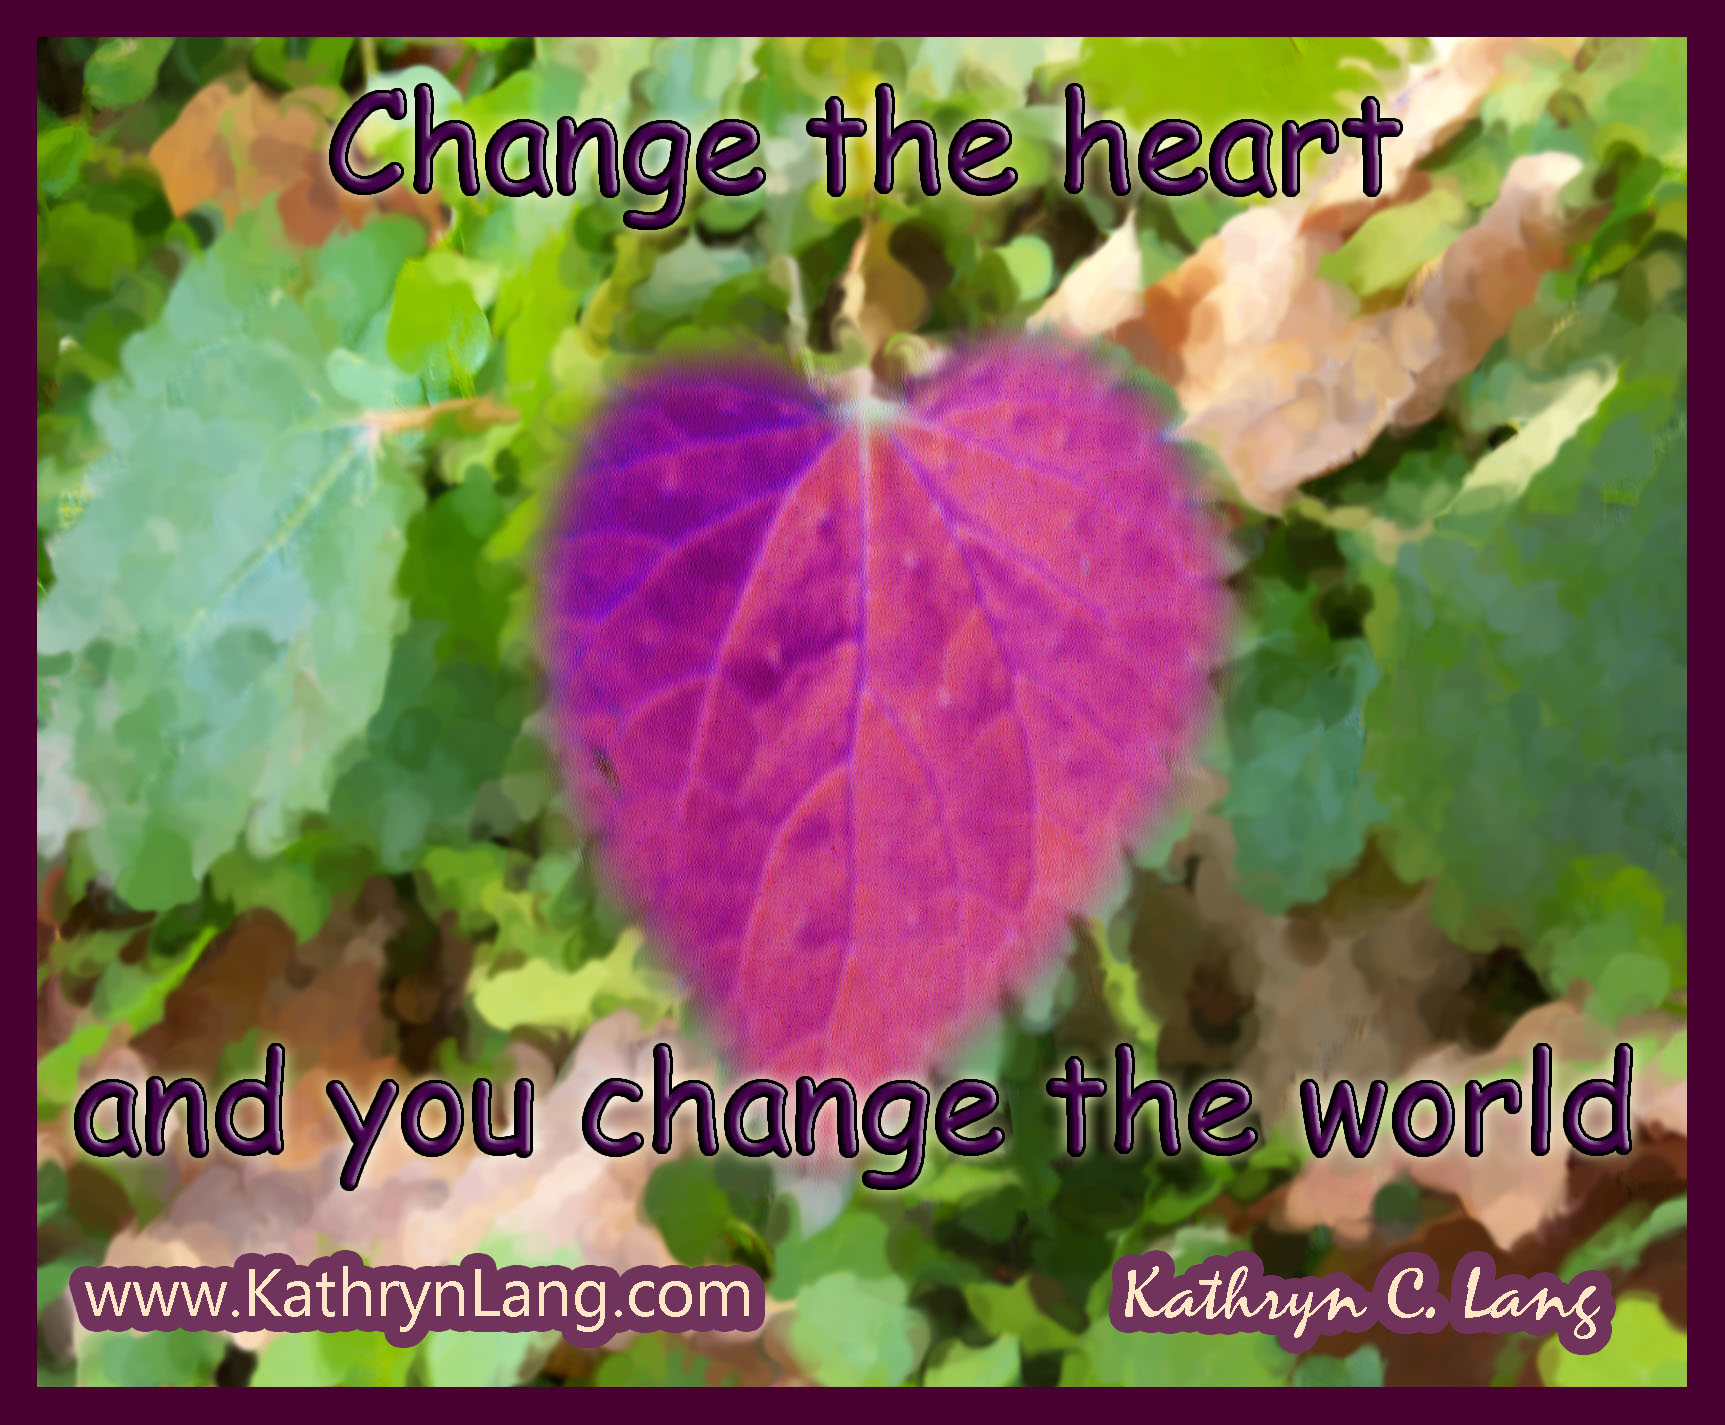 1-21-15 change the heart